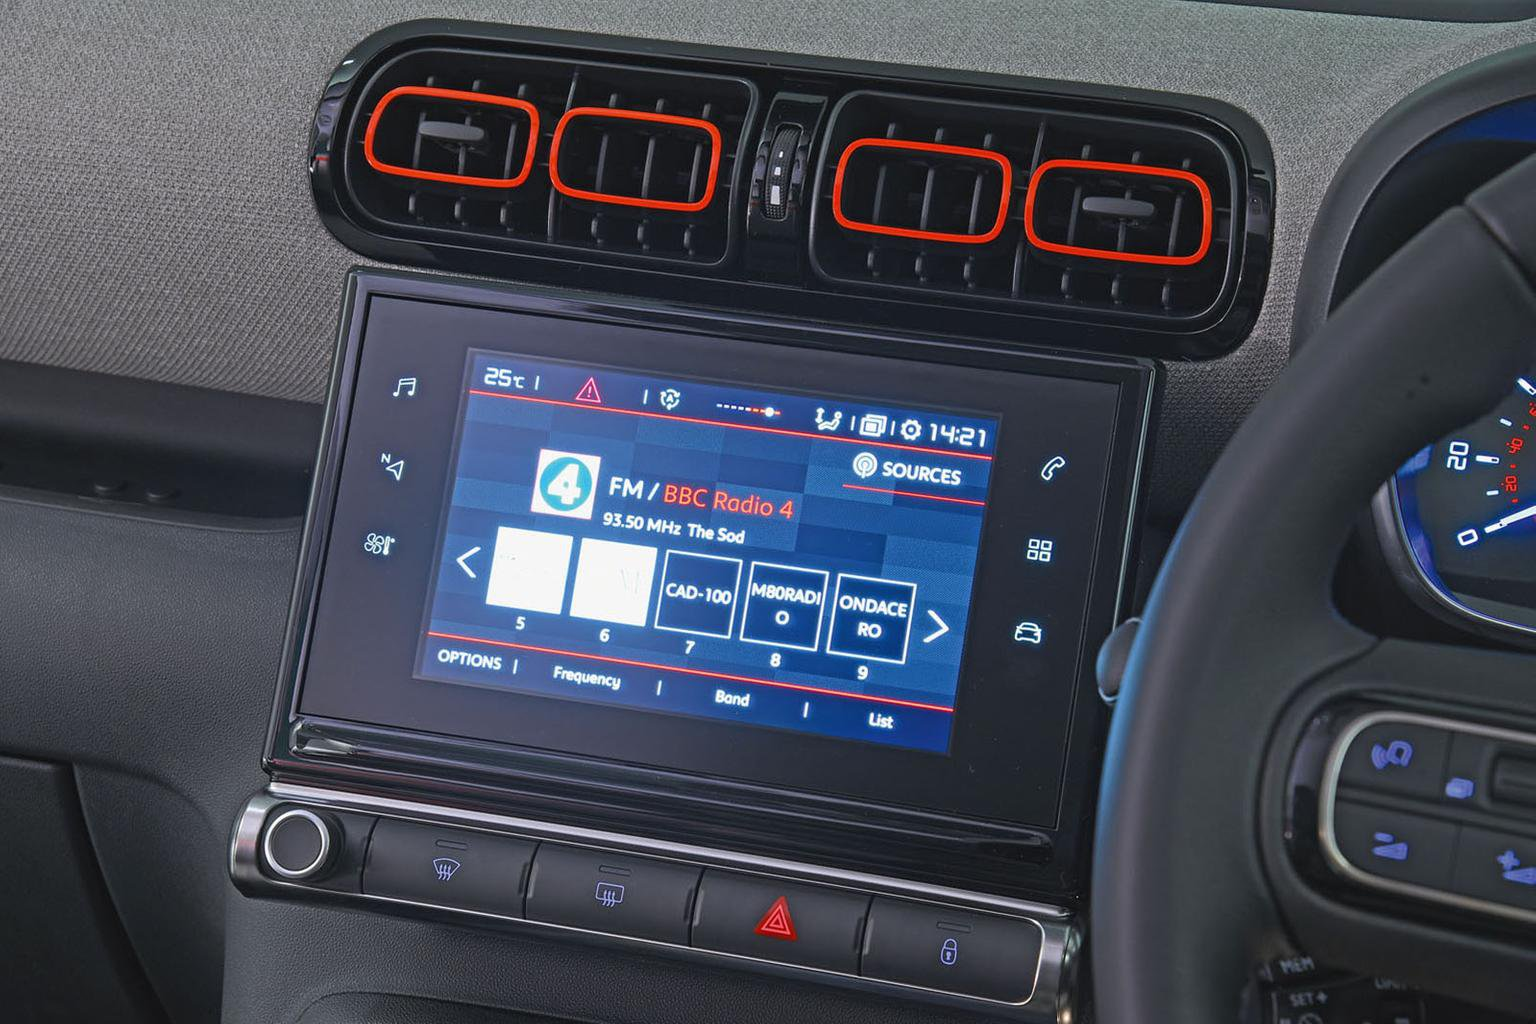 Citroën C3 Aircross infotainment